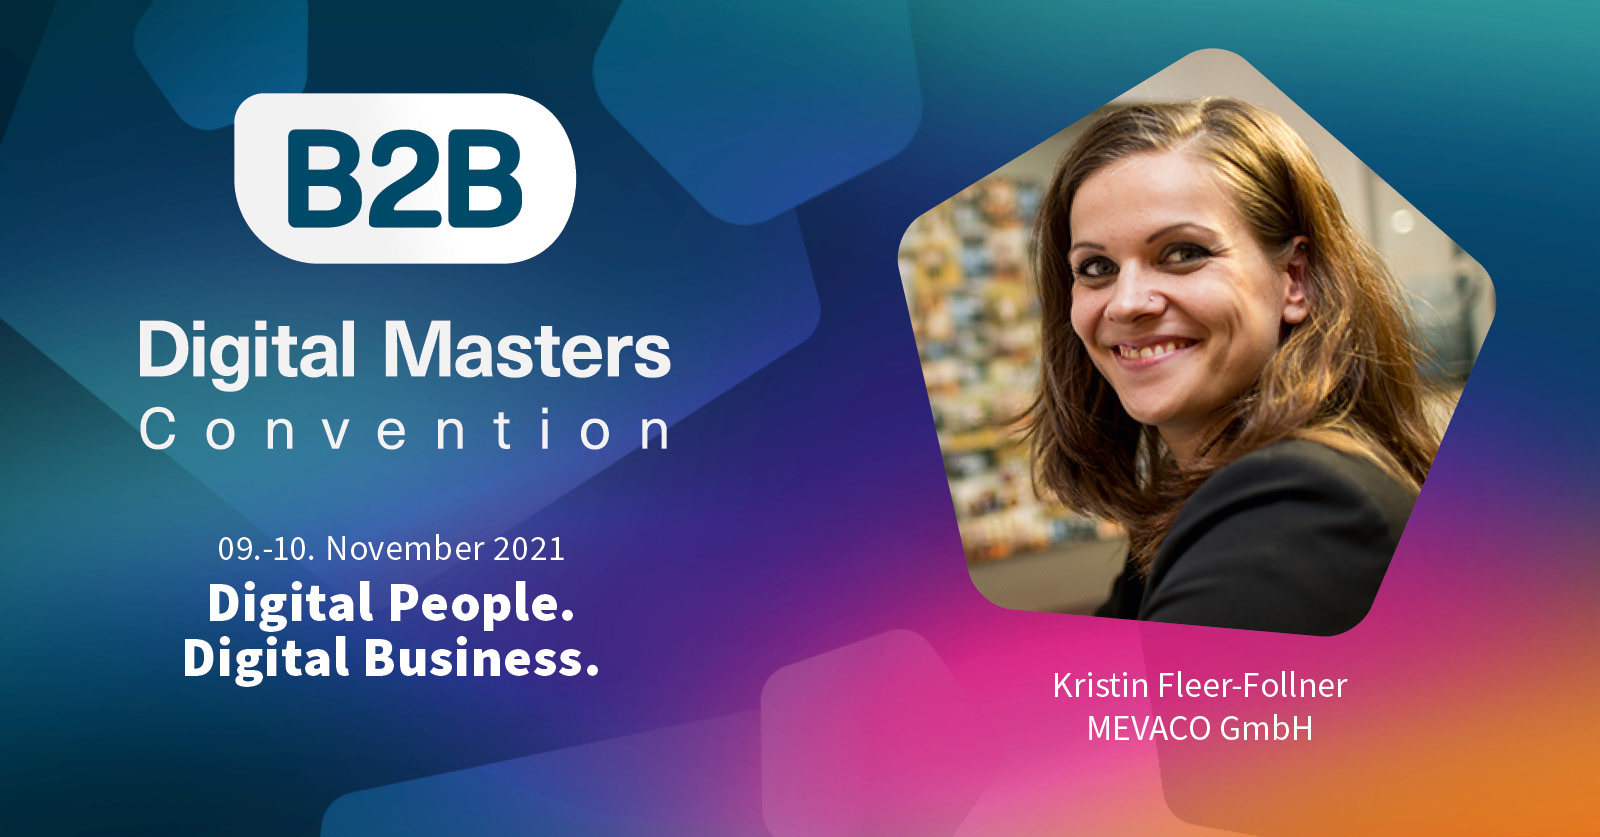 Interview B2BDMC21 Kristin FleerFollner MEVACO